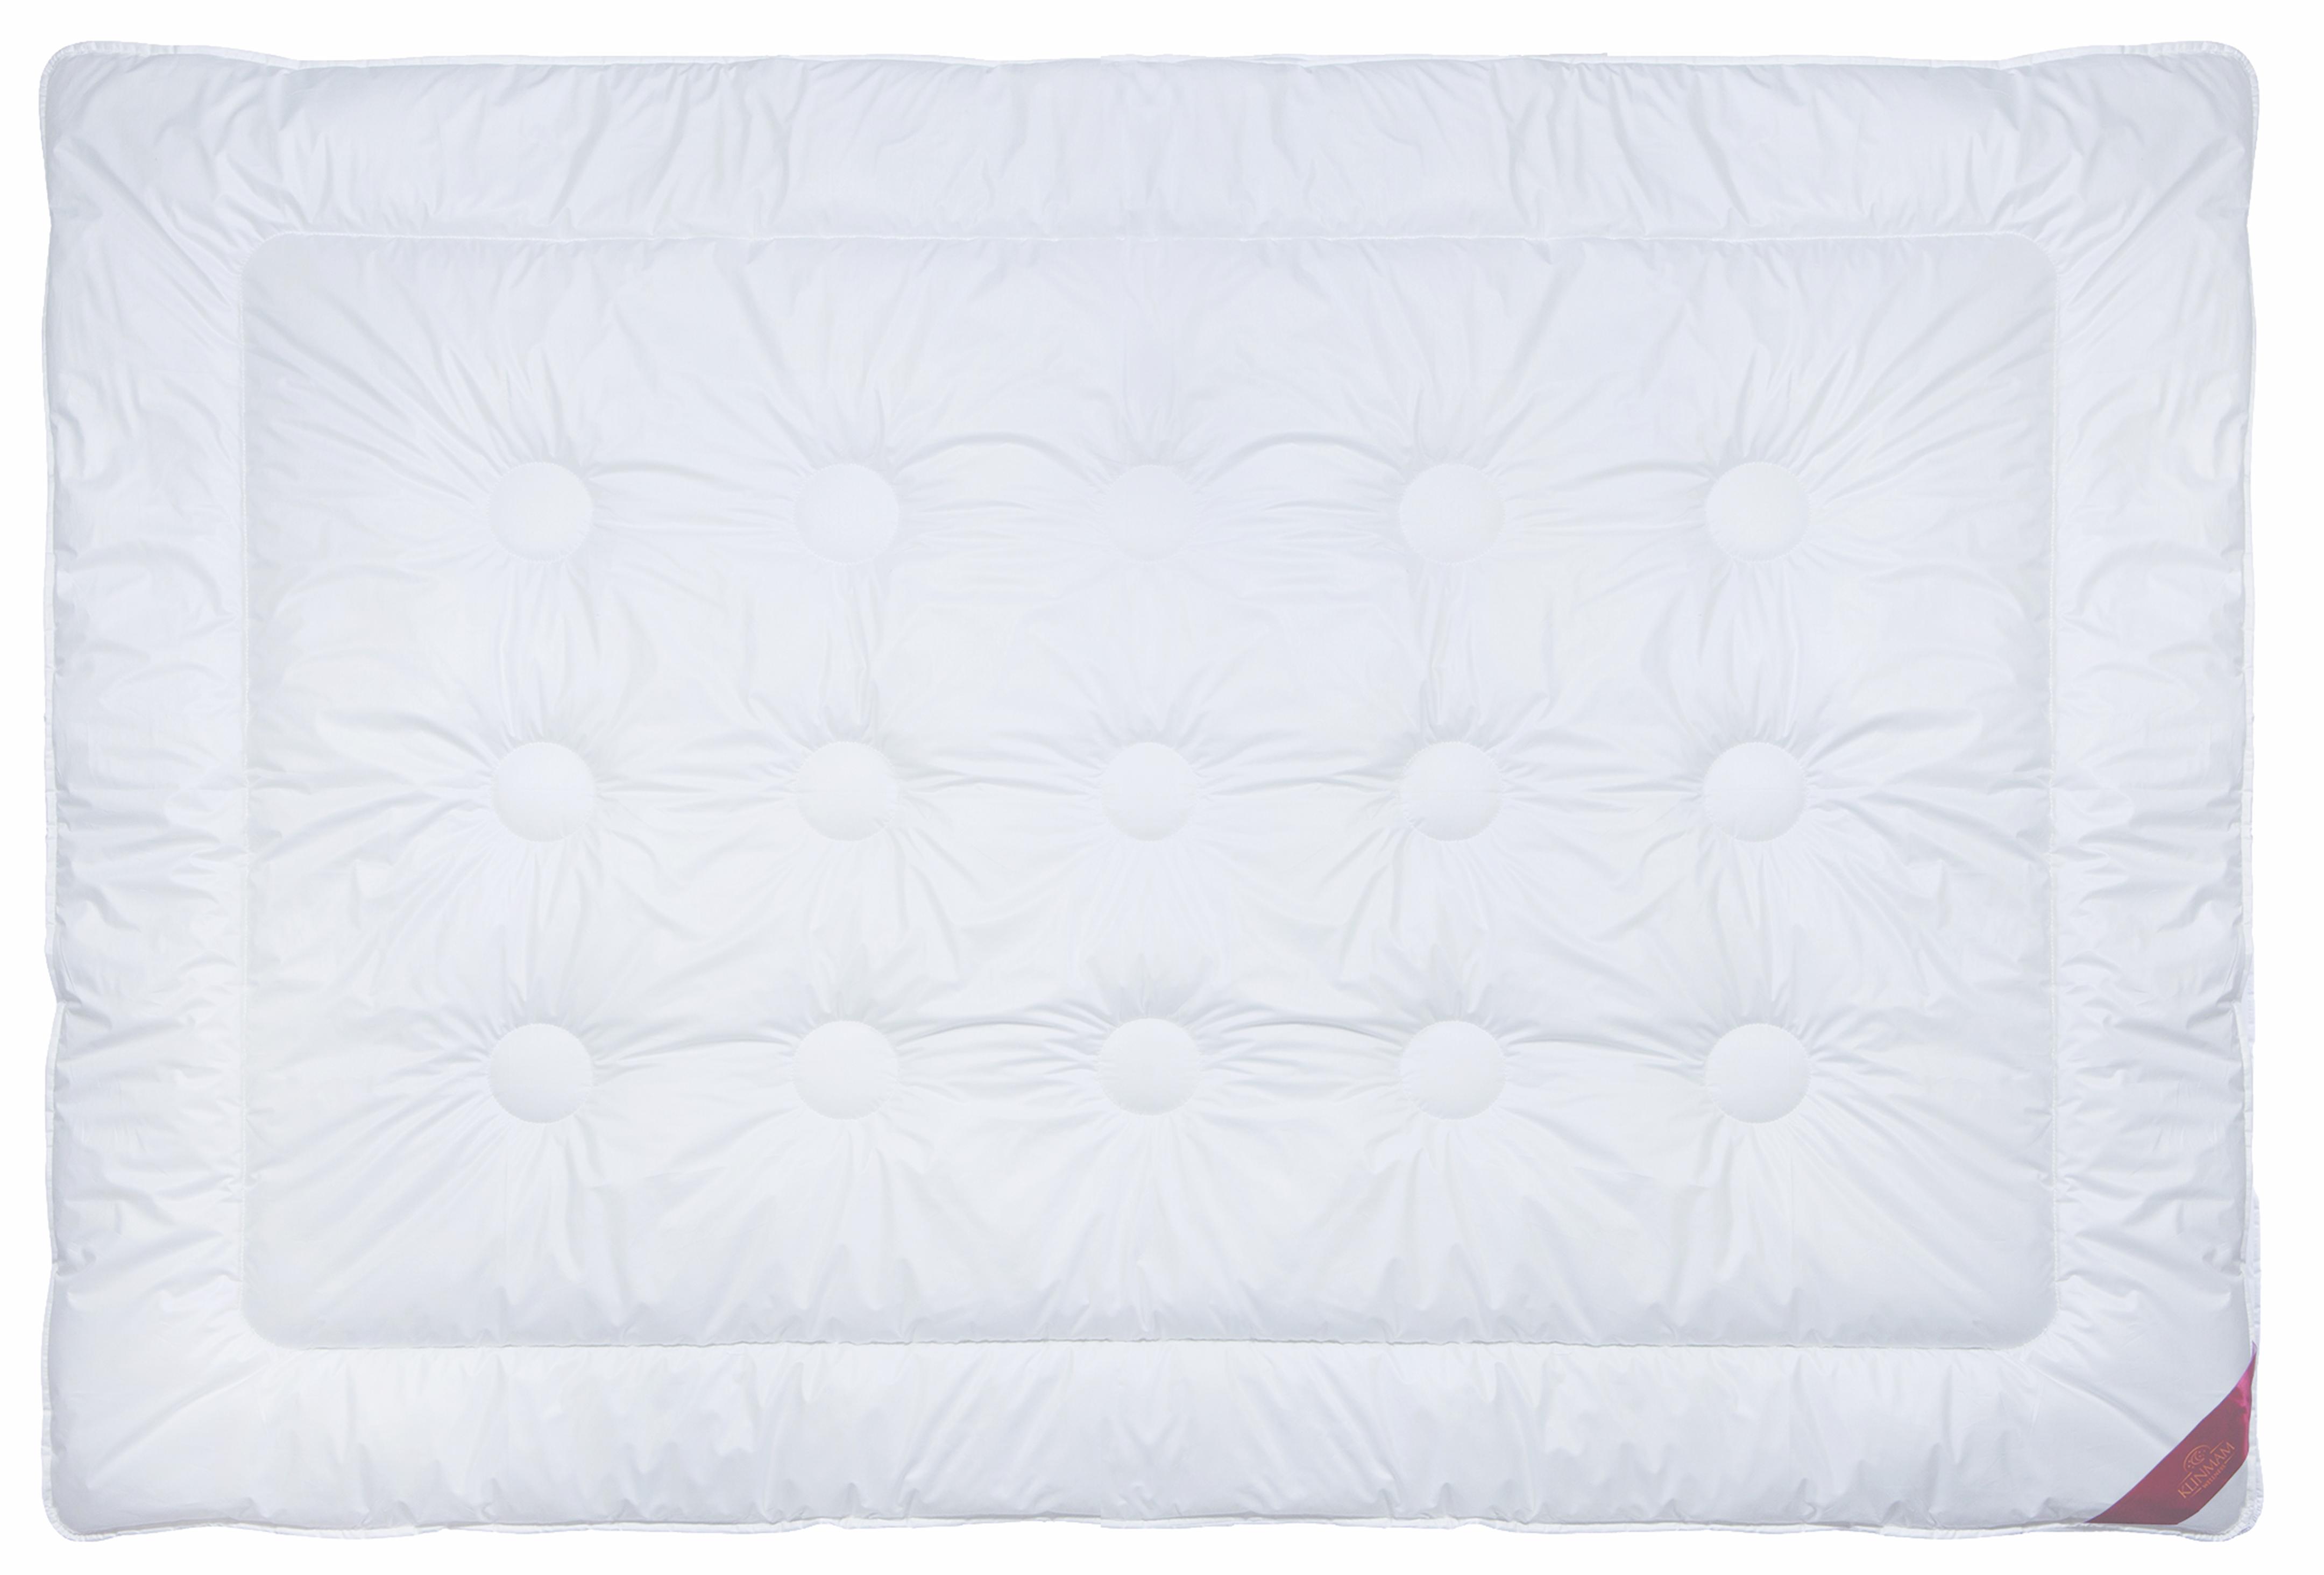 Dreamfill Přikrývka - 135 x 200 cm - Klinmam